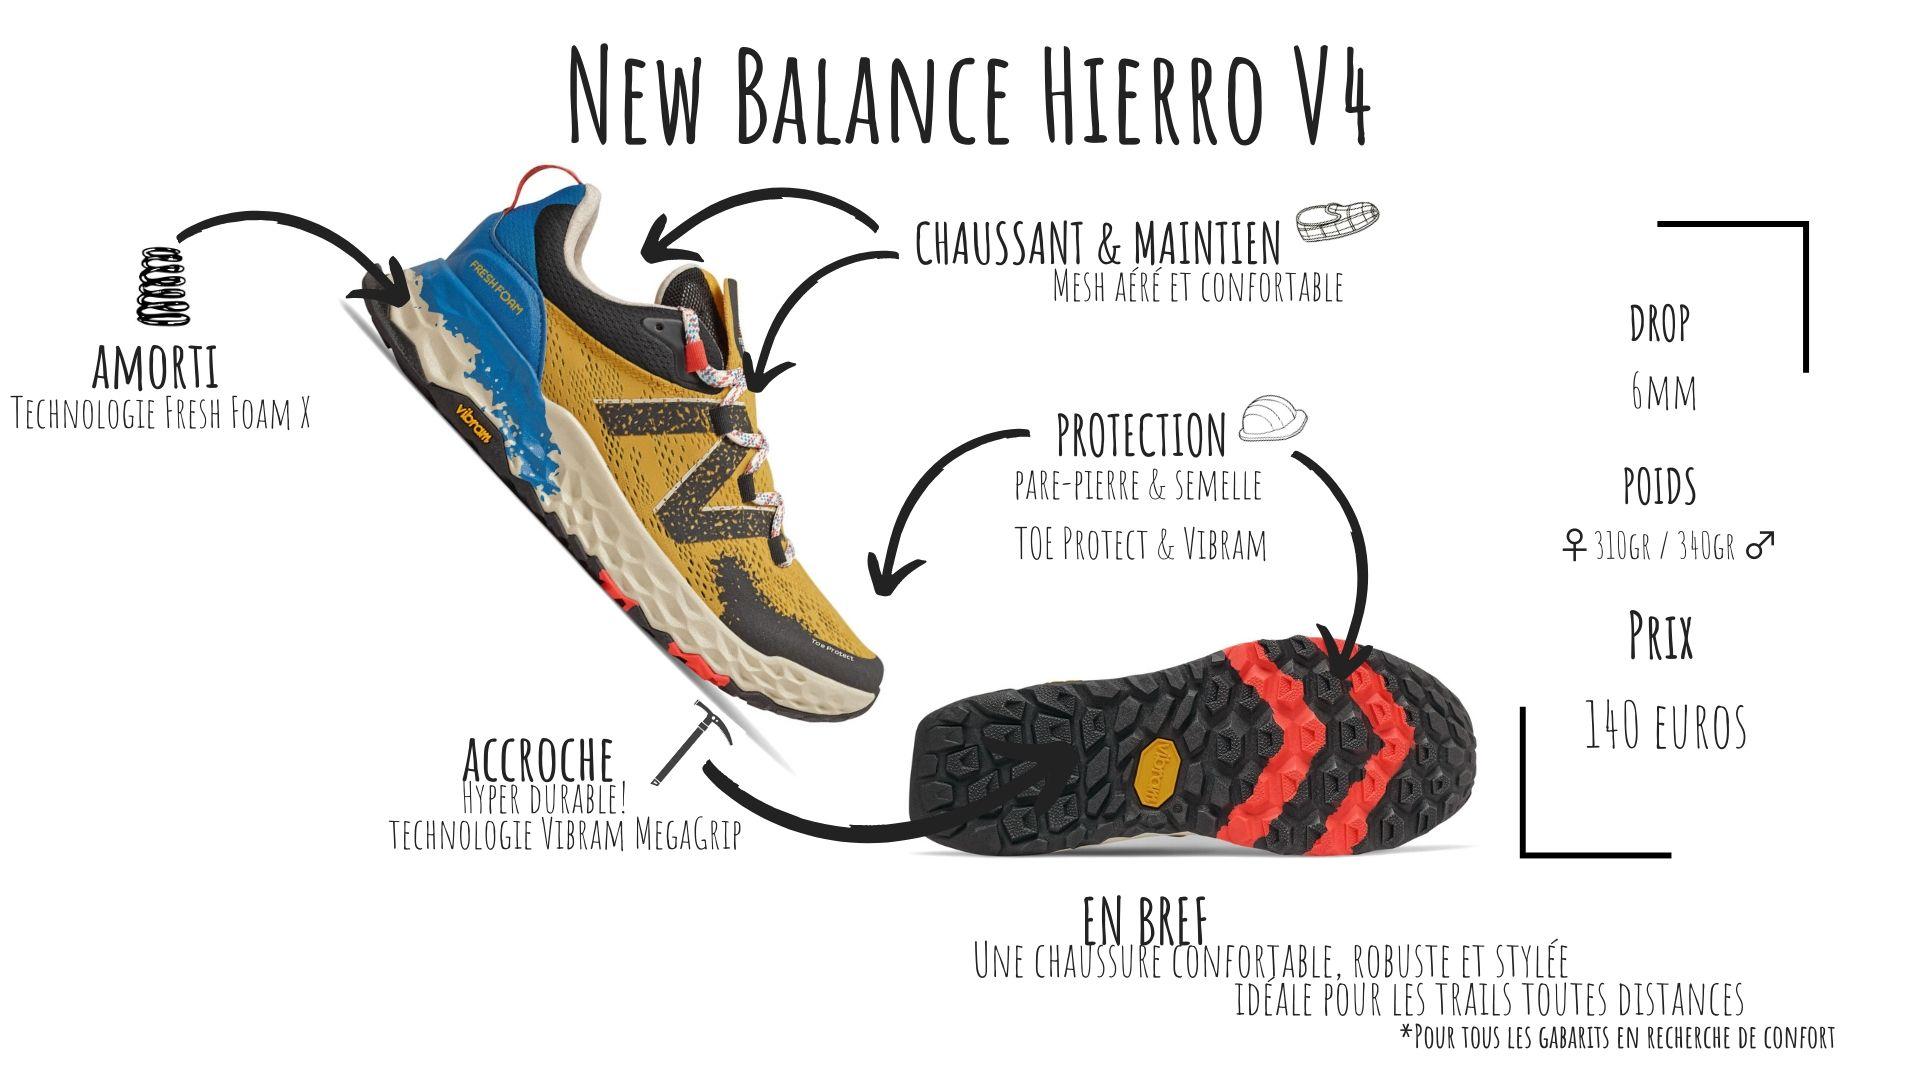 chaussure trail new balance hierro 4